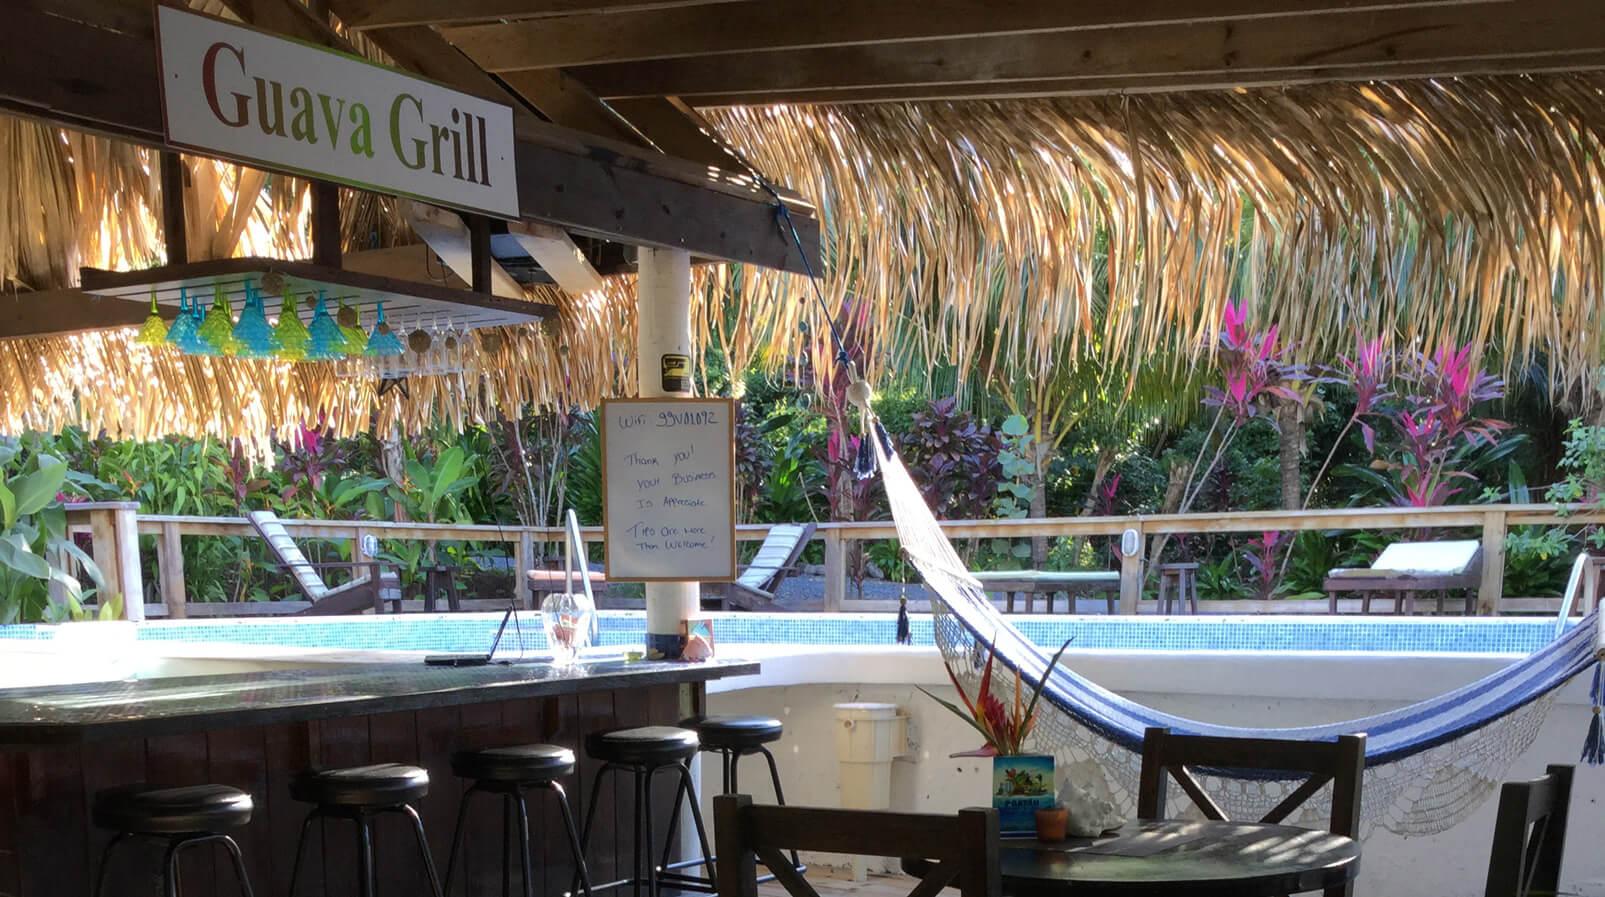 https://secureservercdn.net/166.62.111.174/170.2f8.myftpupload.com/wp-content/uploads/2016/05/guava-restaurant.jpg?time=1606269874